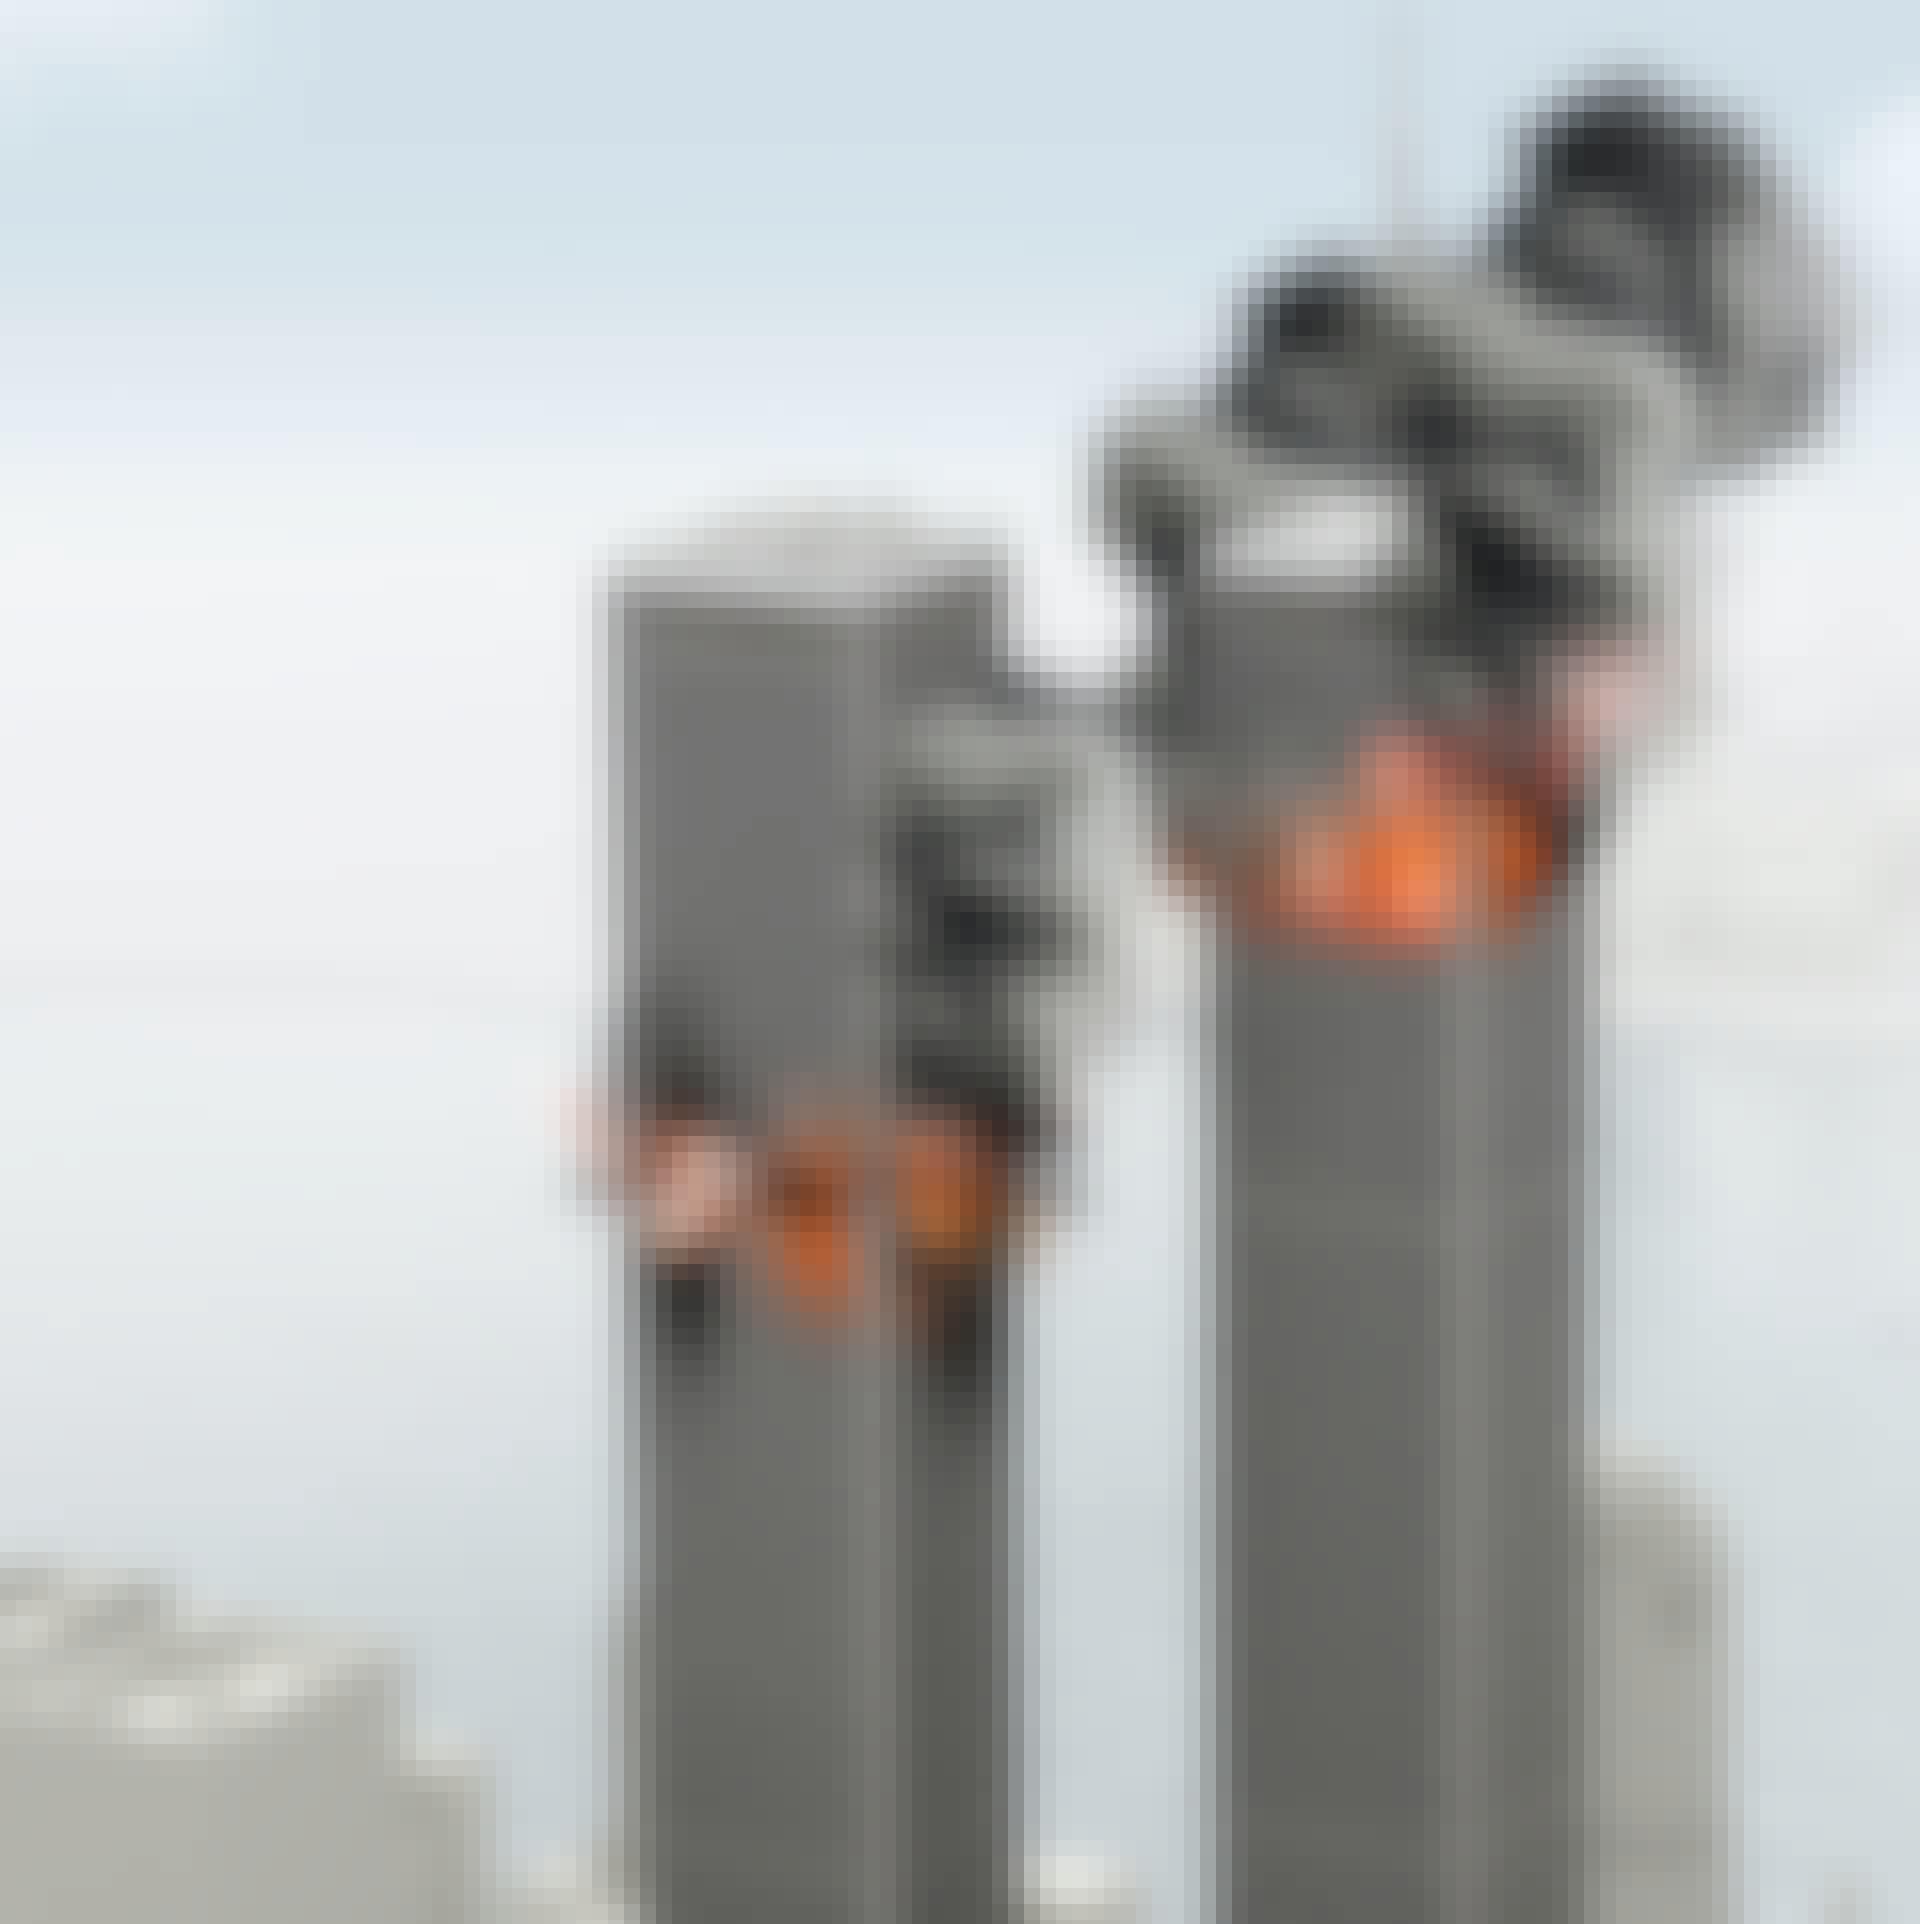 Tornit sortuvat: Vaihe 2